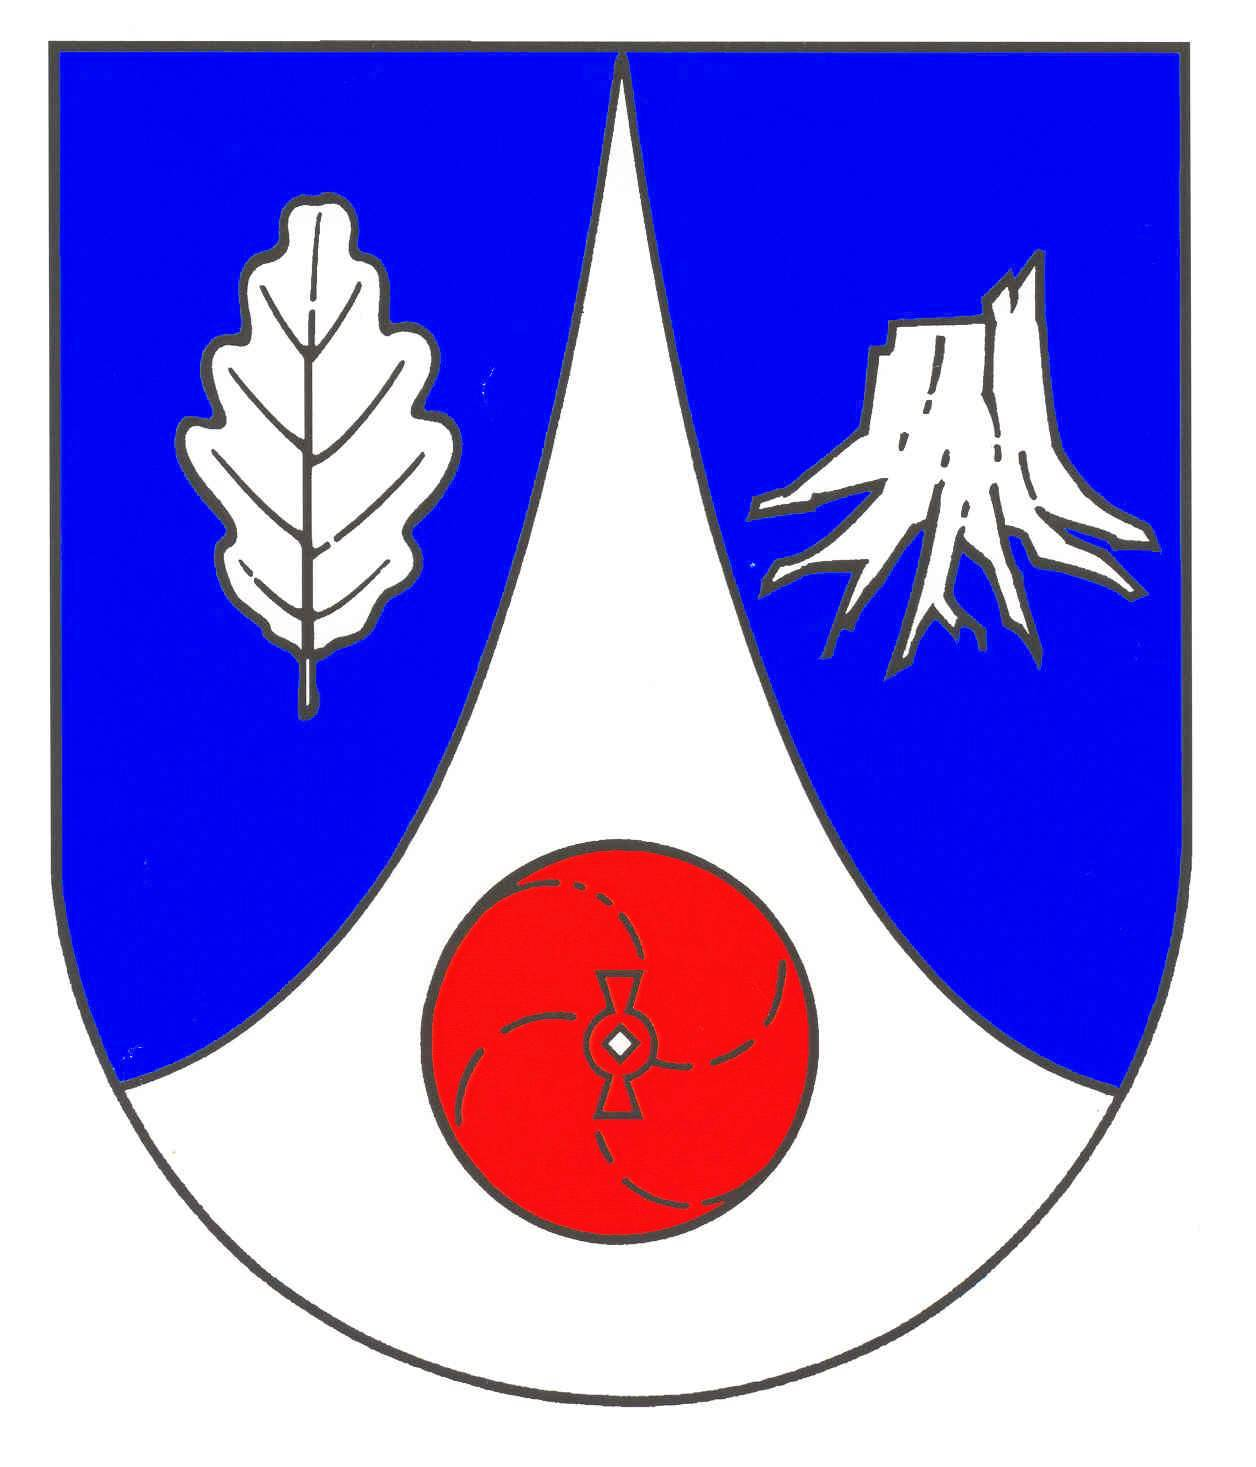 Wappen GemeindeNeuengörs, Kreis Segeberg